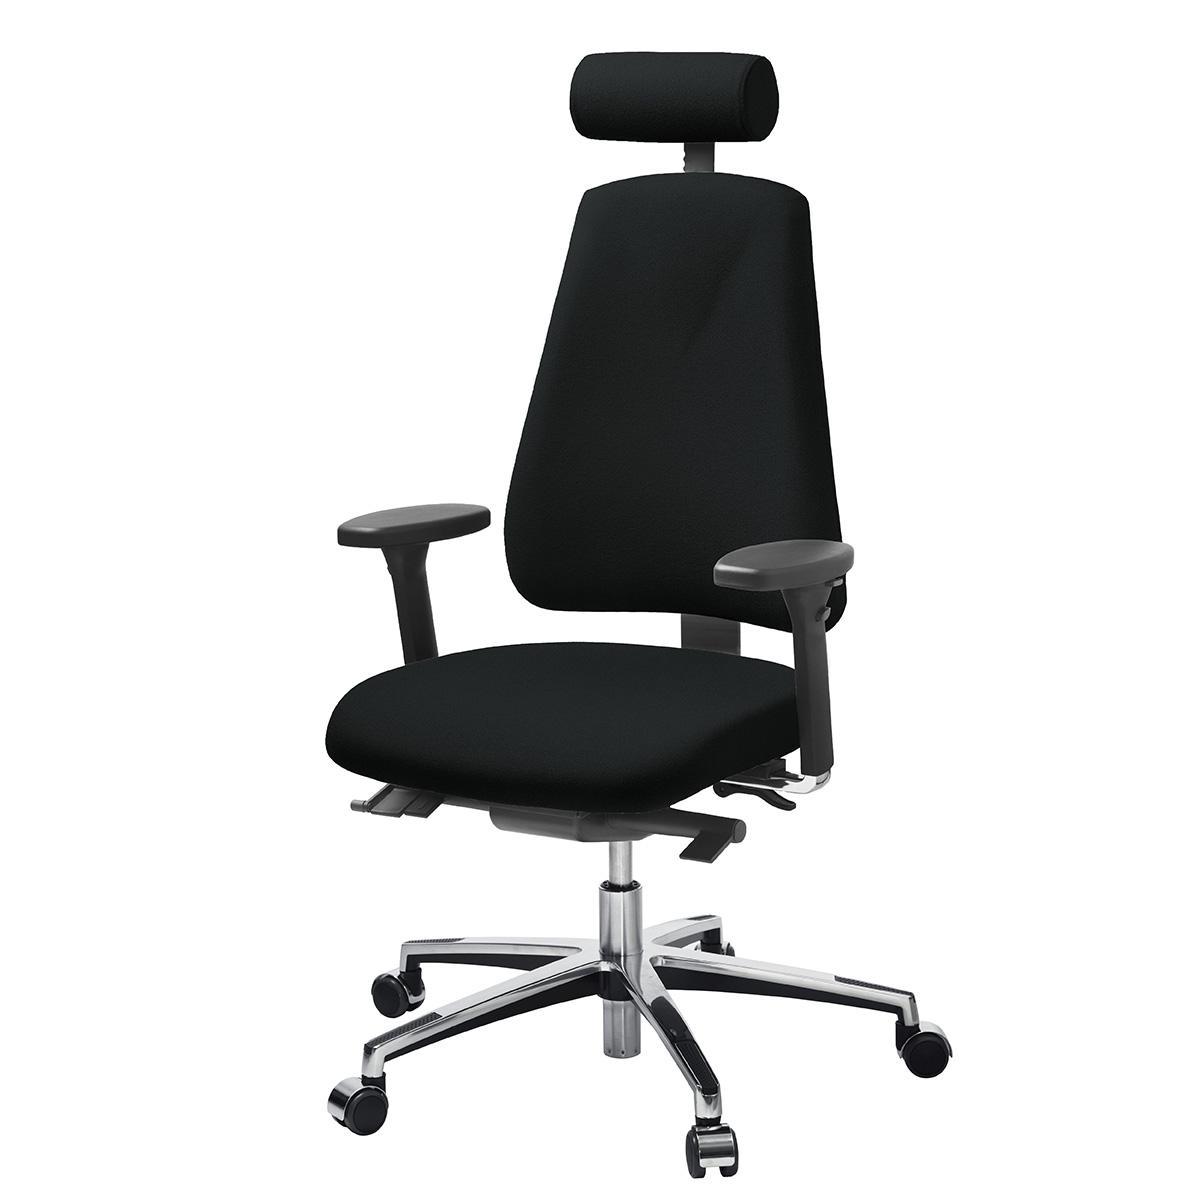 Kontorsstol LANAB LD6340 Multisynkron, svart textil, kromat stativ